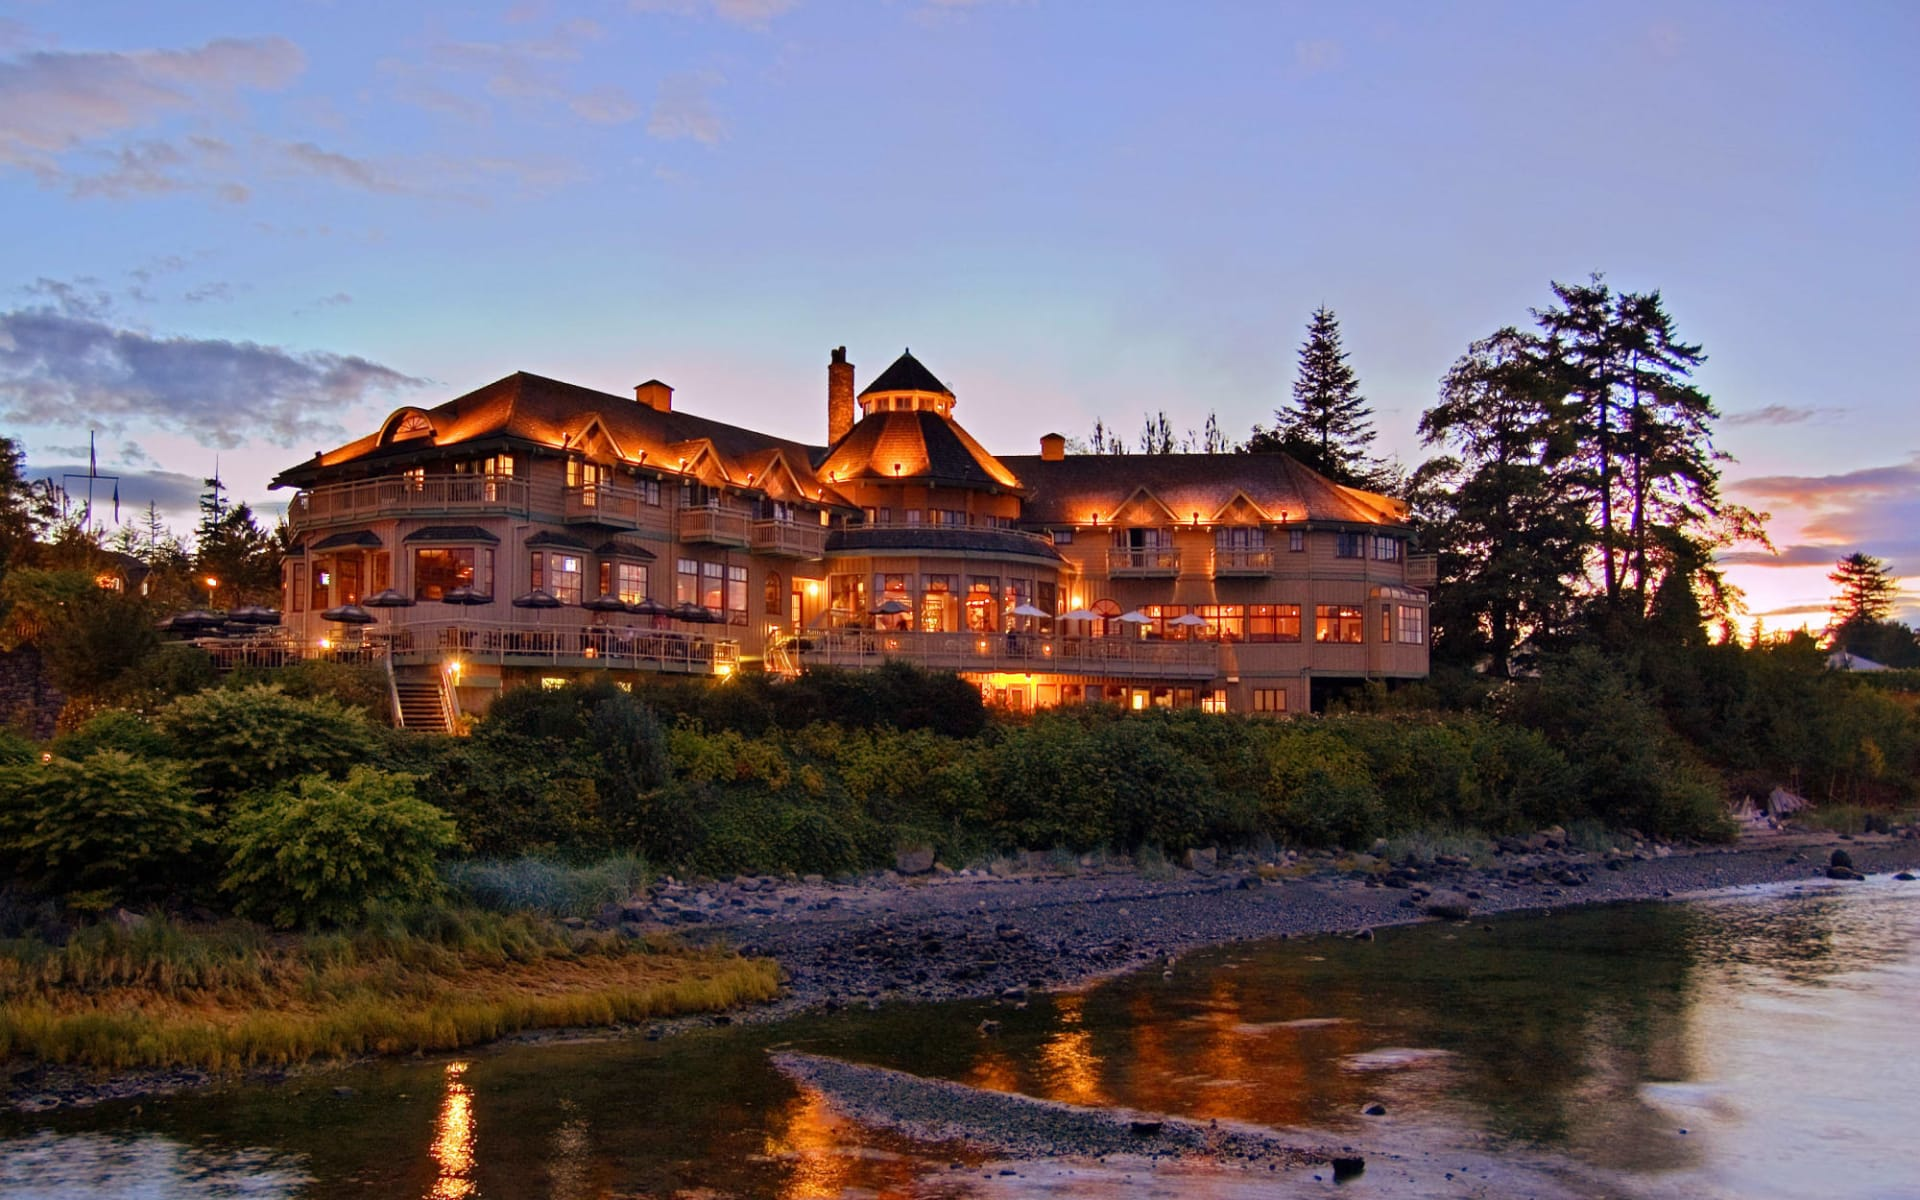 Painter's Lodge Holiday & Fishing Resort in Campbell River:  Painter'sLodgeFishingResort